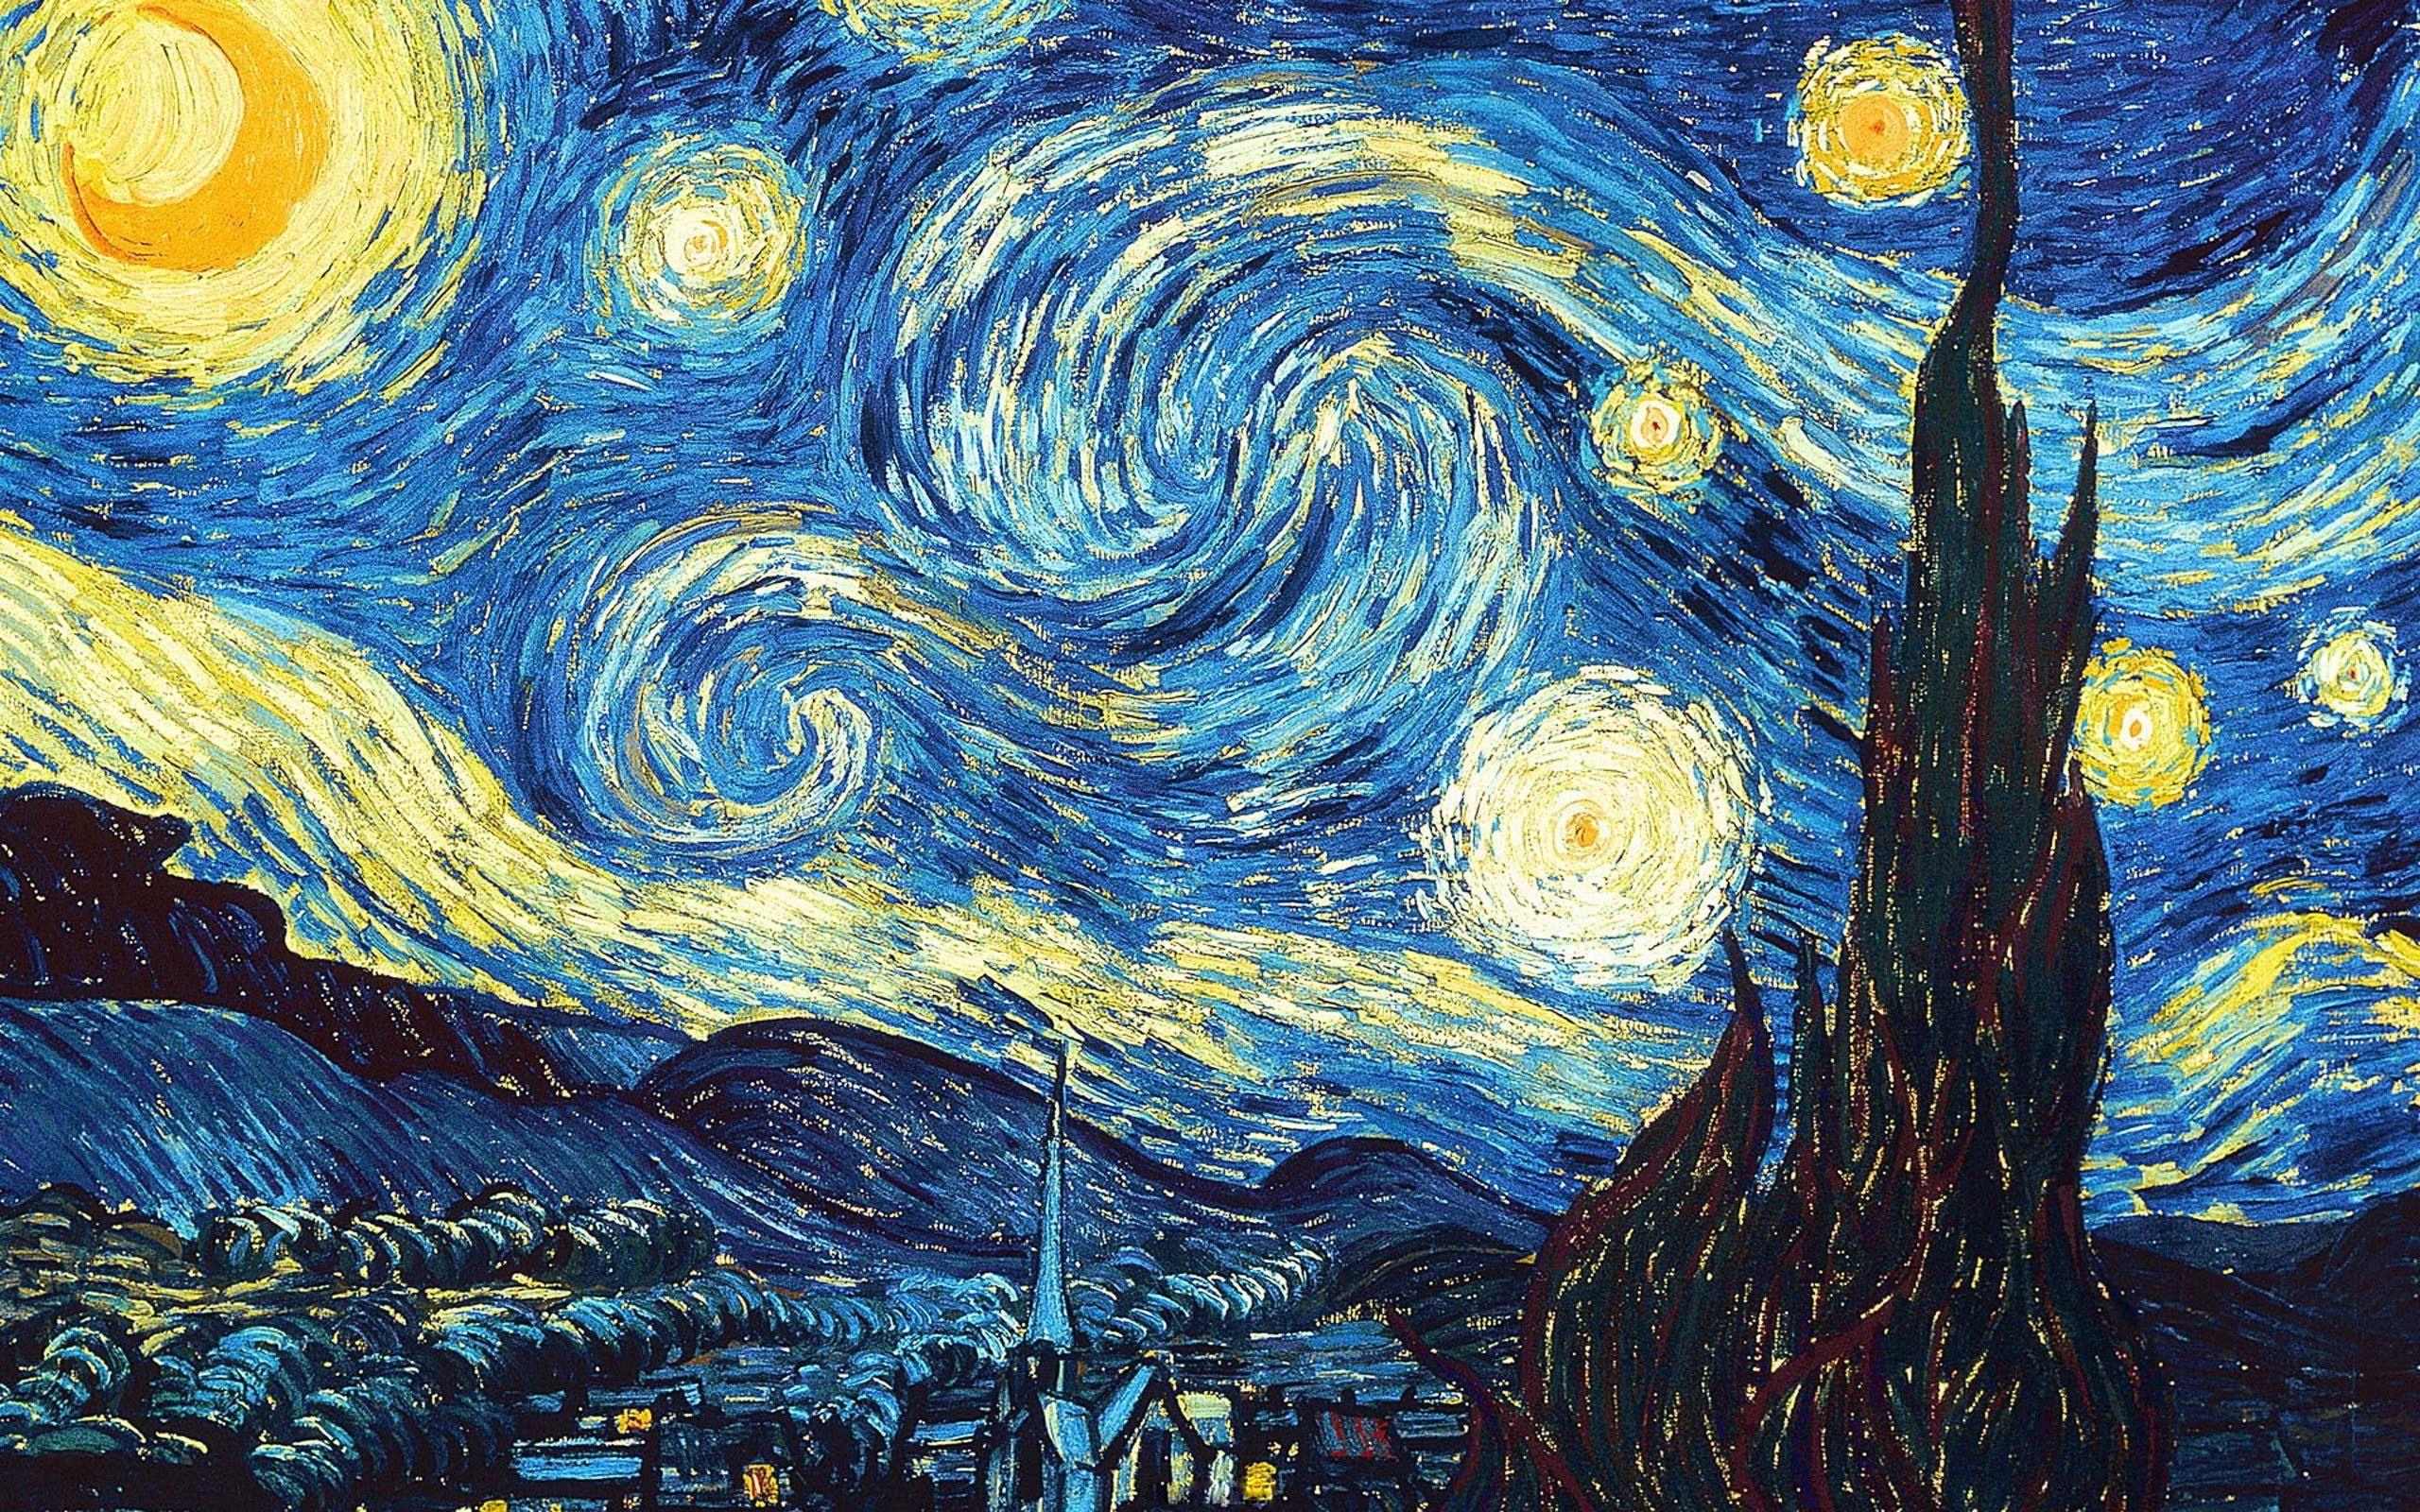 Classy Fantasy Art The Starry Night Vincent Van Gogh 2k Wallpaper Hdwallpaper Desktop In 2020 Starry Night Van Gogh Van Gogh Wallpaper Starry Night Wallpaper